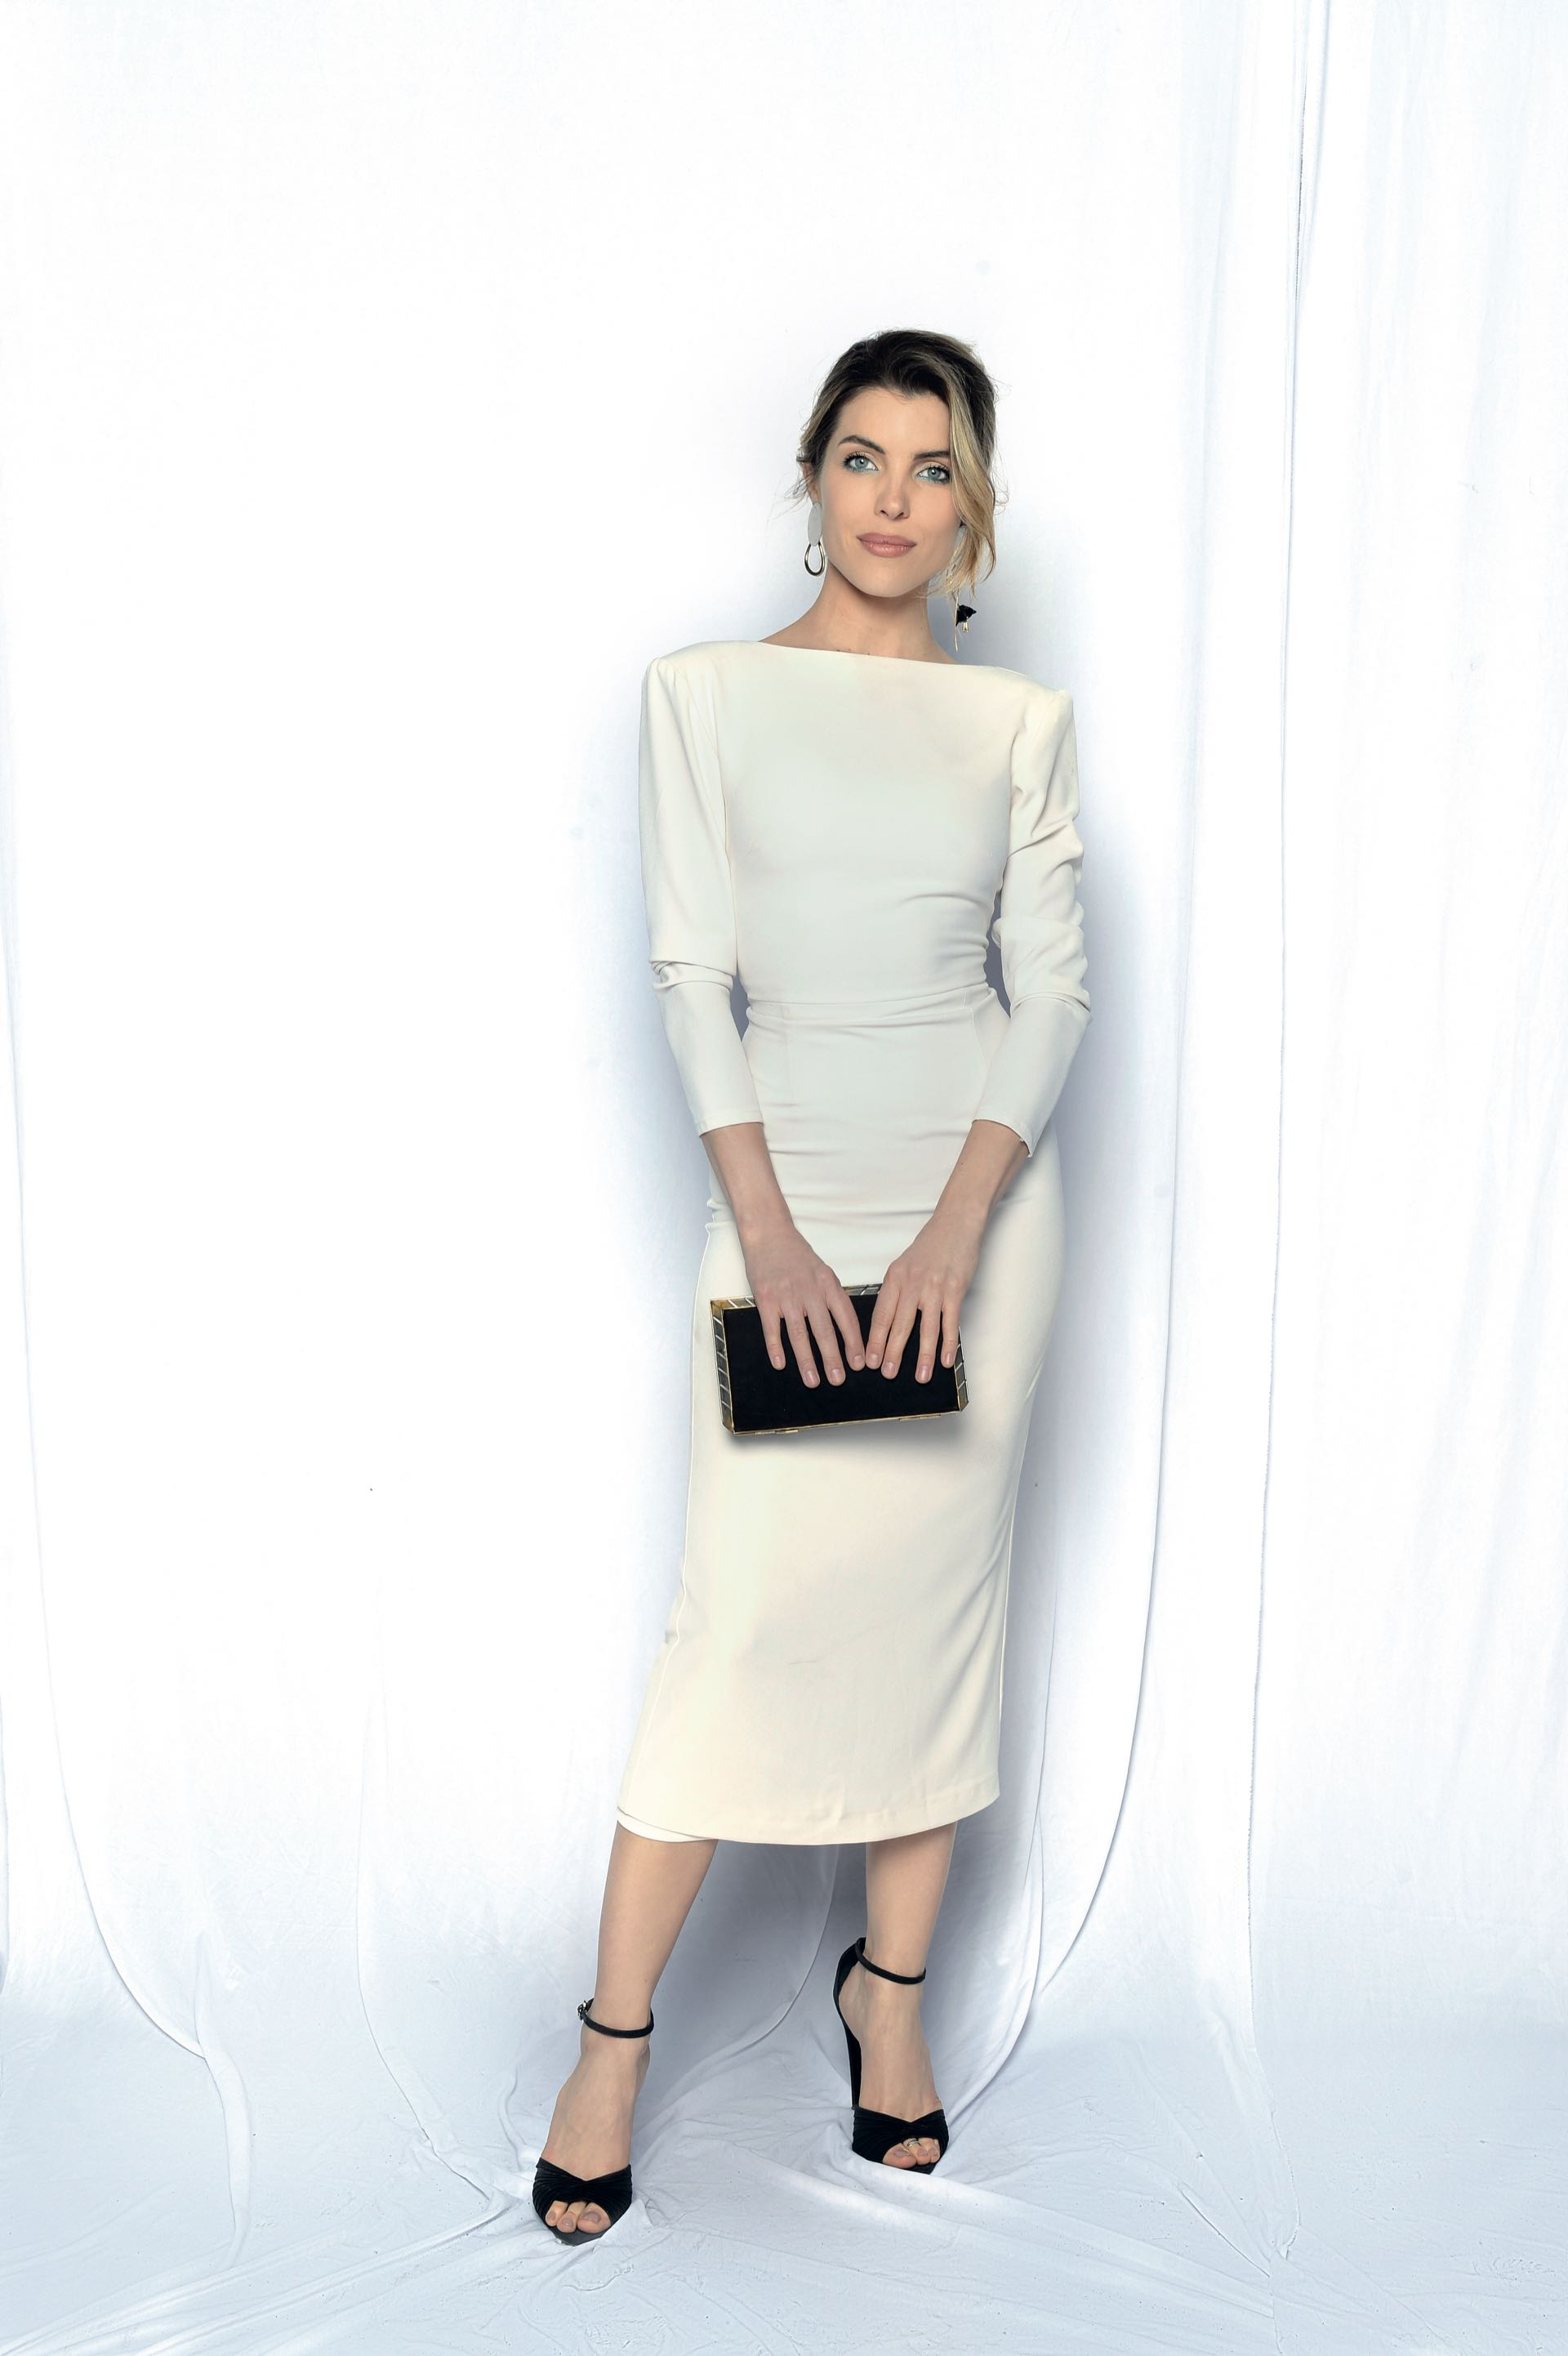 Josefina Scaglione by It Dress, con sandalias Ralph Lauren y clutch vintage. Foto: Diego García/GENTE